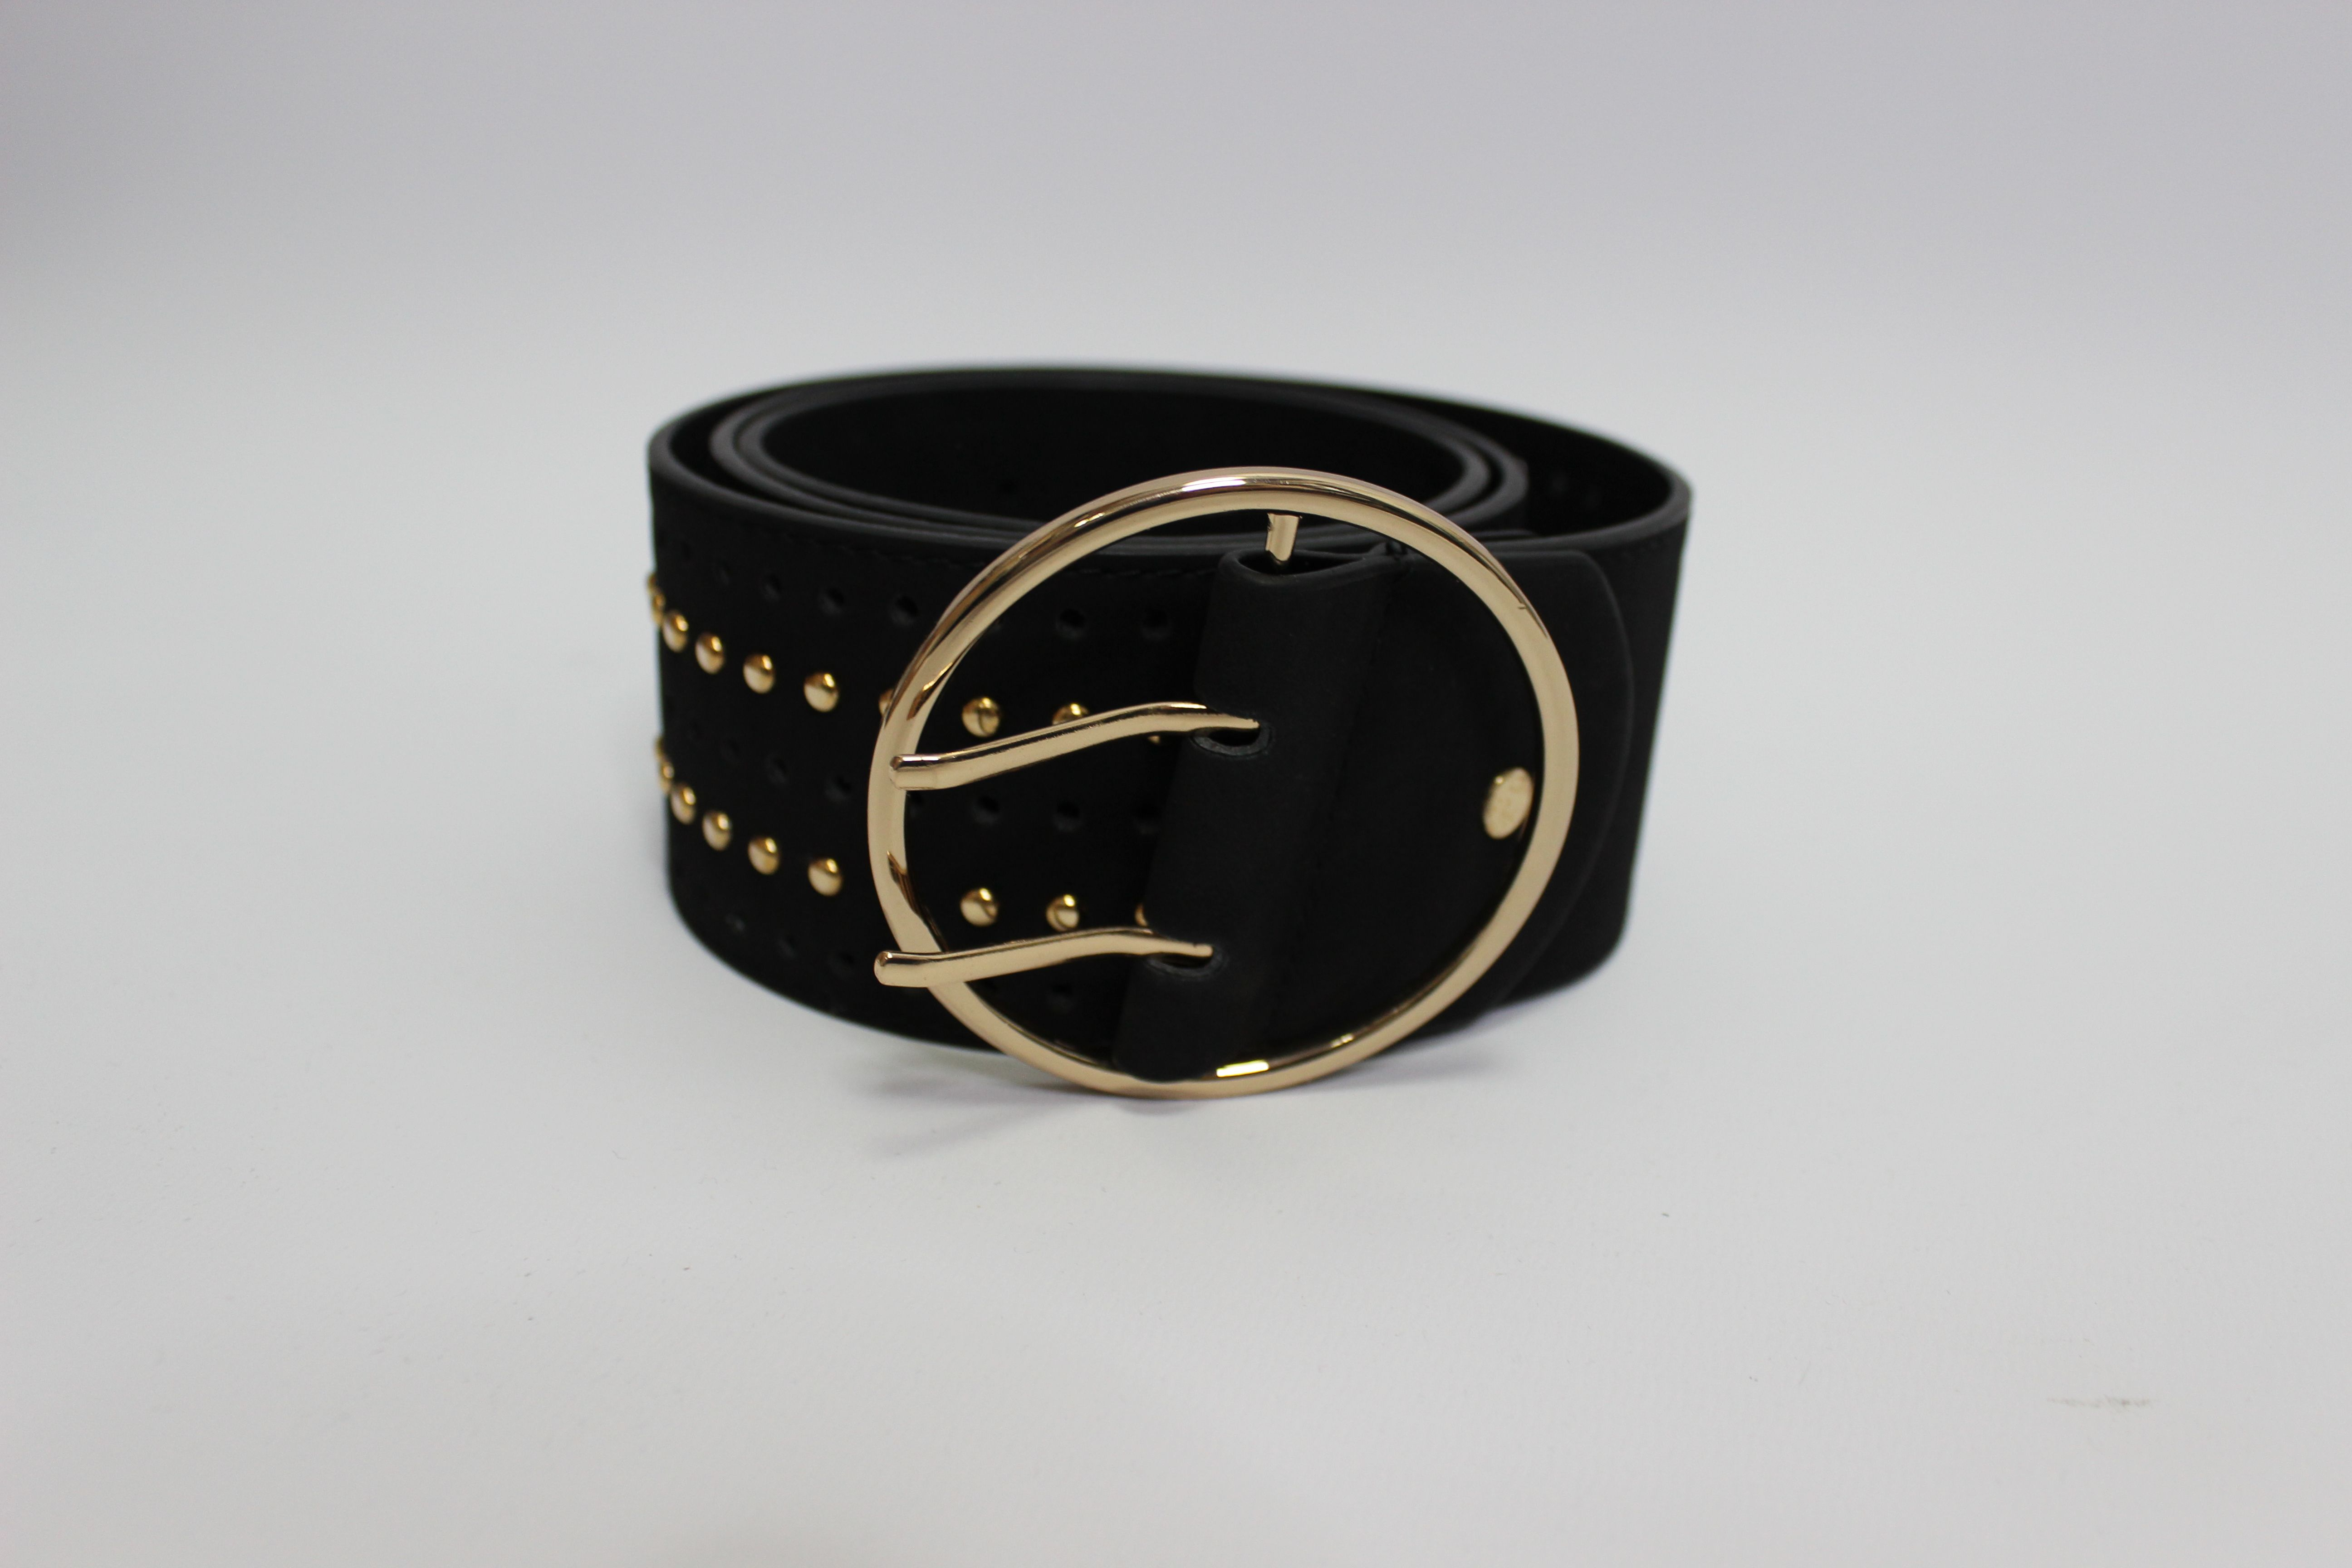 Black Studded Style Belt